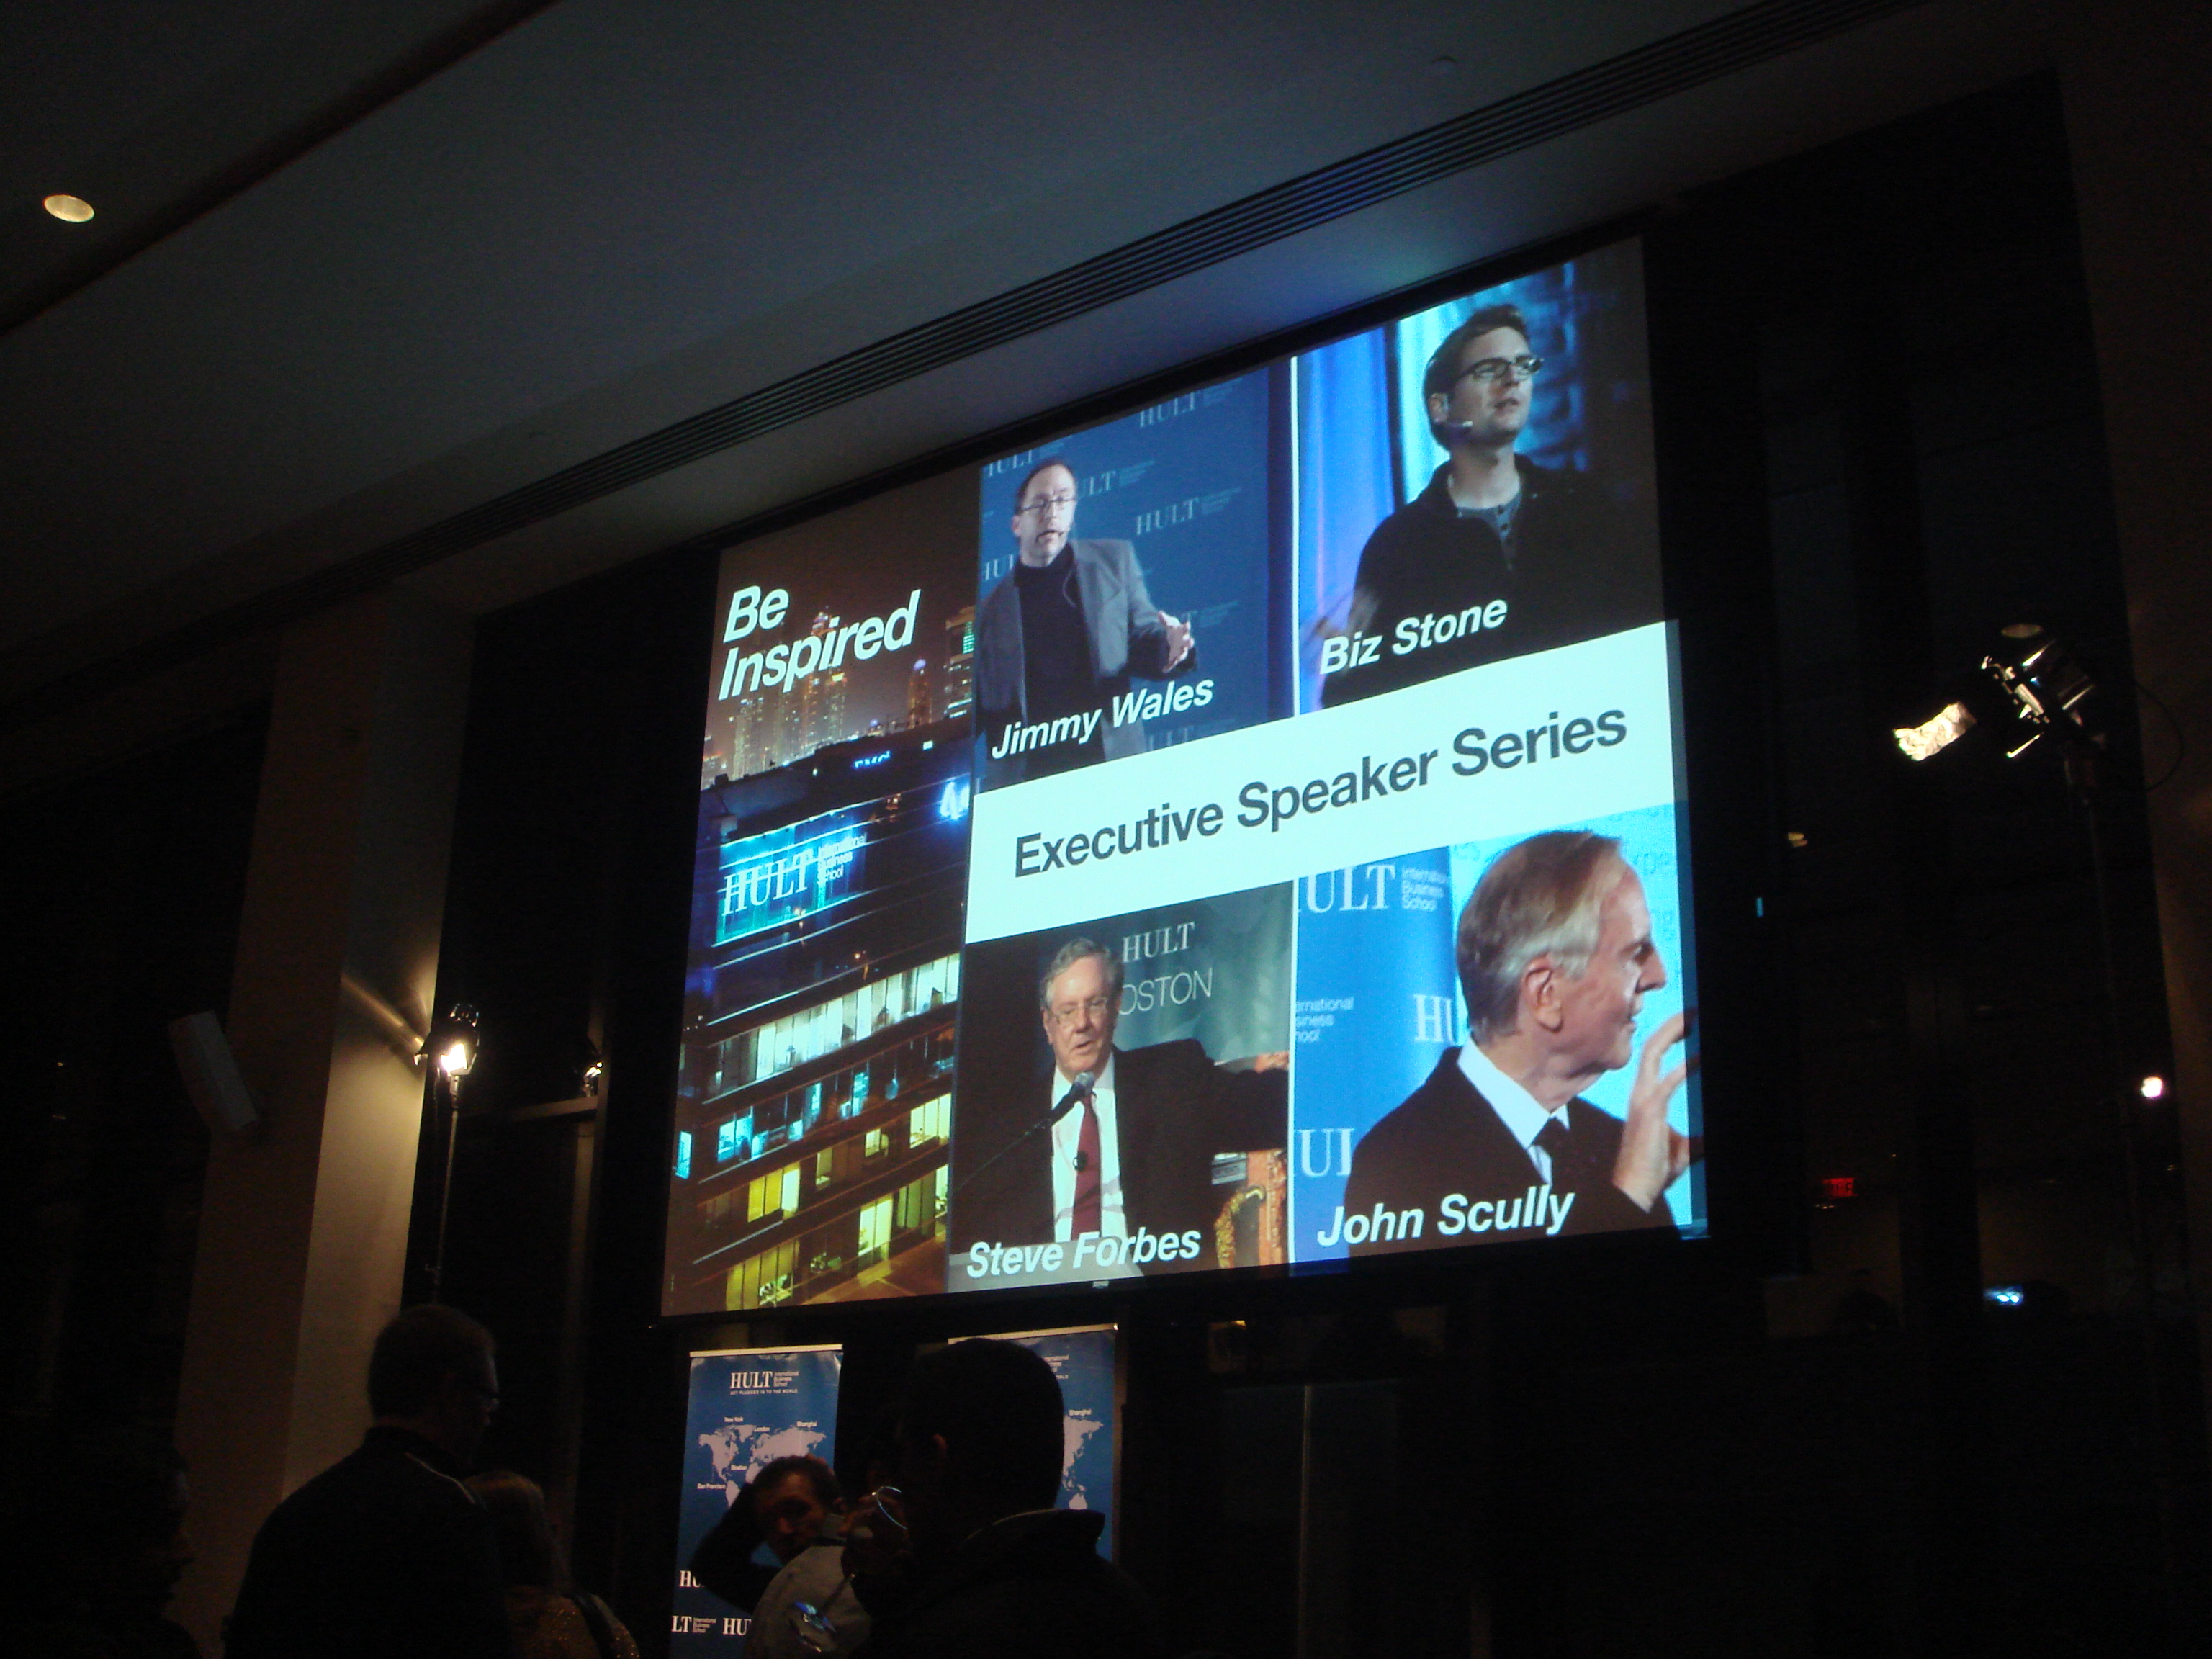 Hult Executive Speaker Series 2013